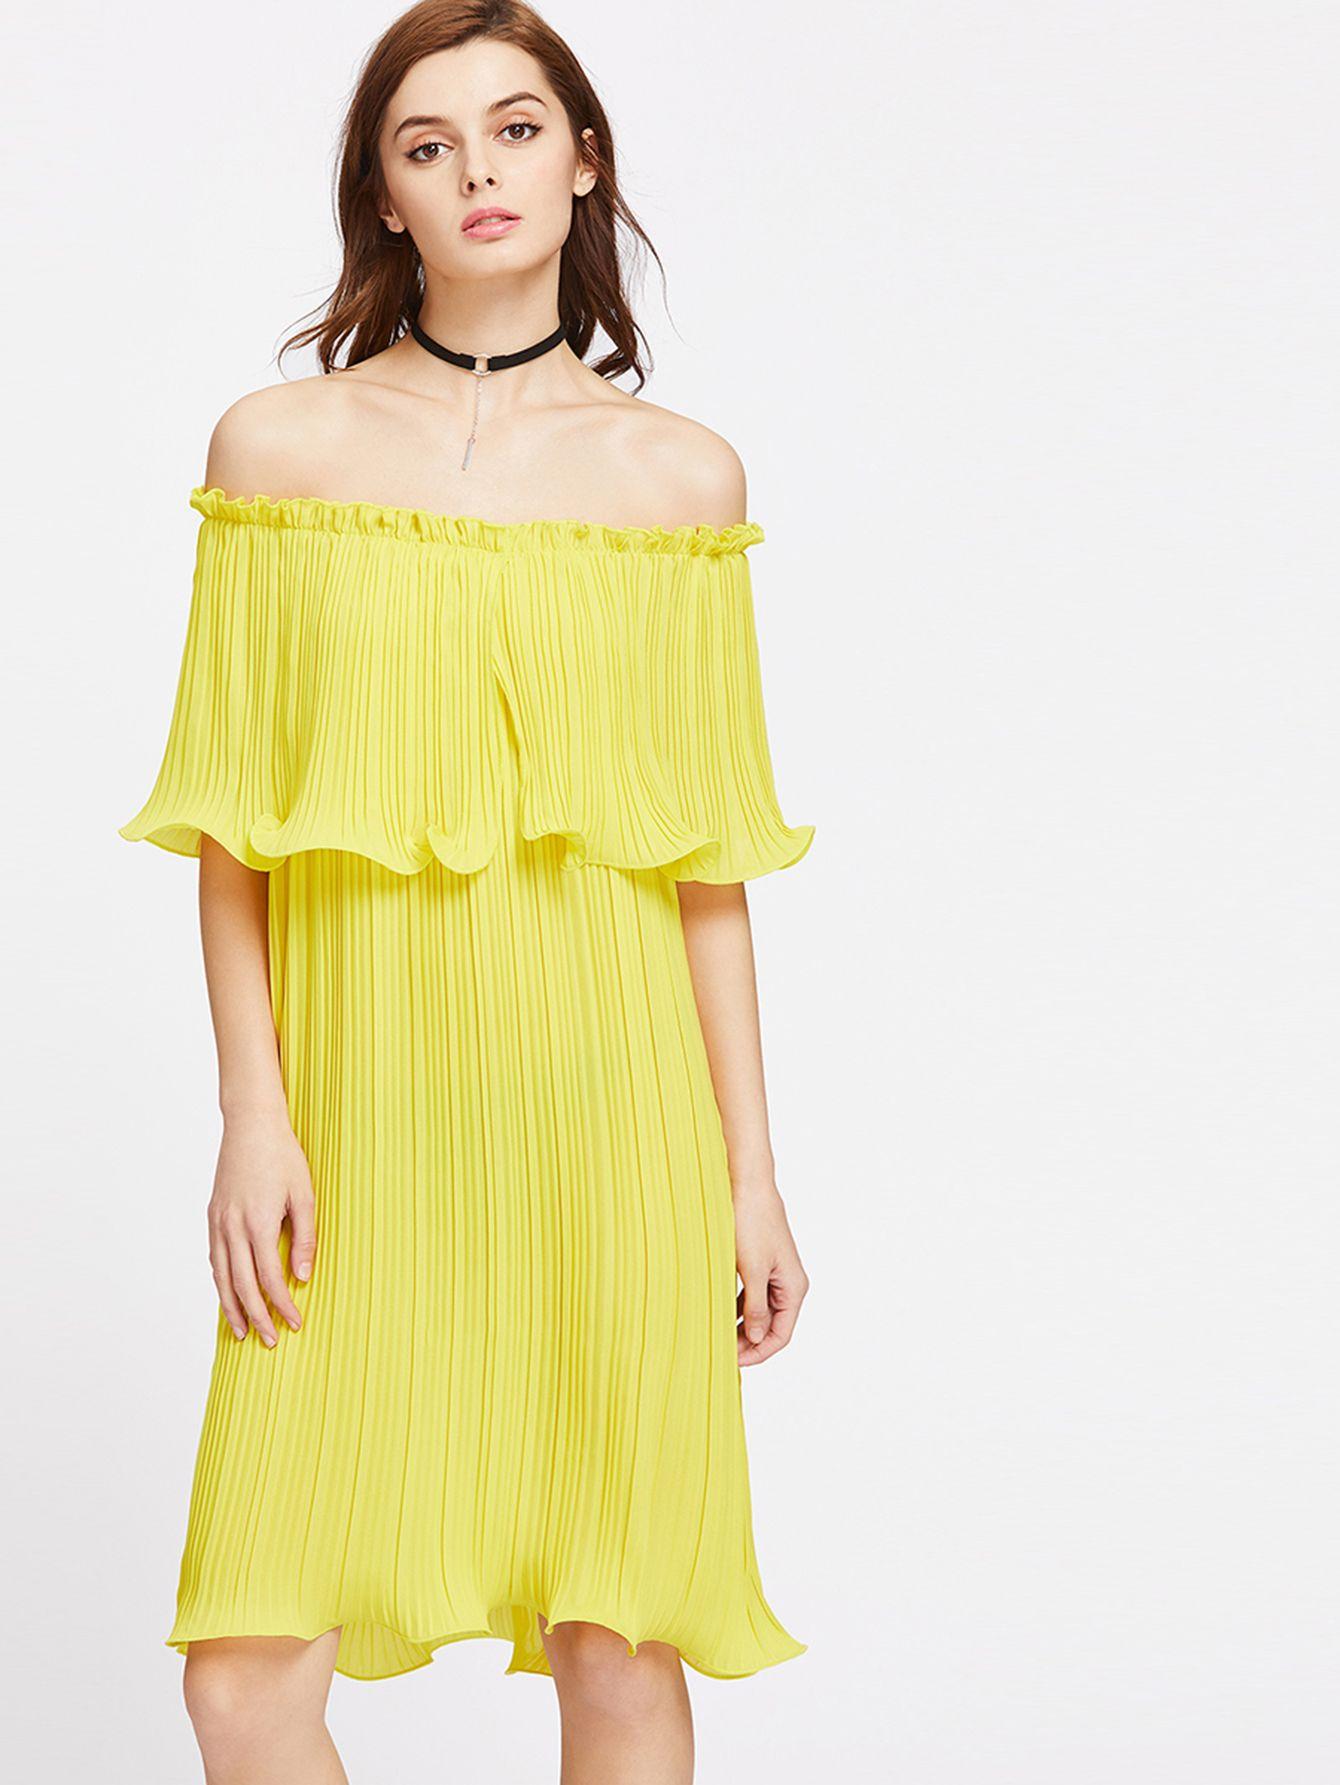 1baeee26977 Shop Lettuce Hem Pleated Layered Off Shoulder Dress online. SheIn ...